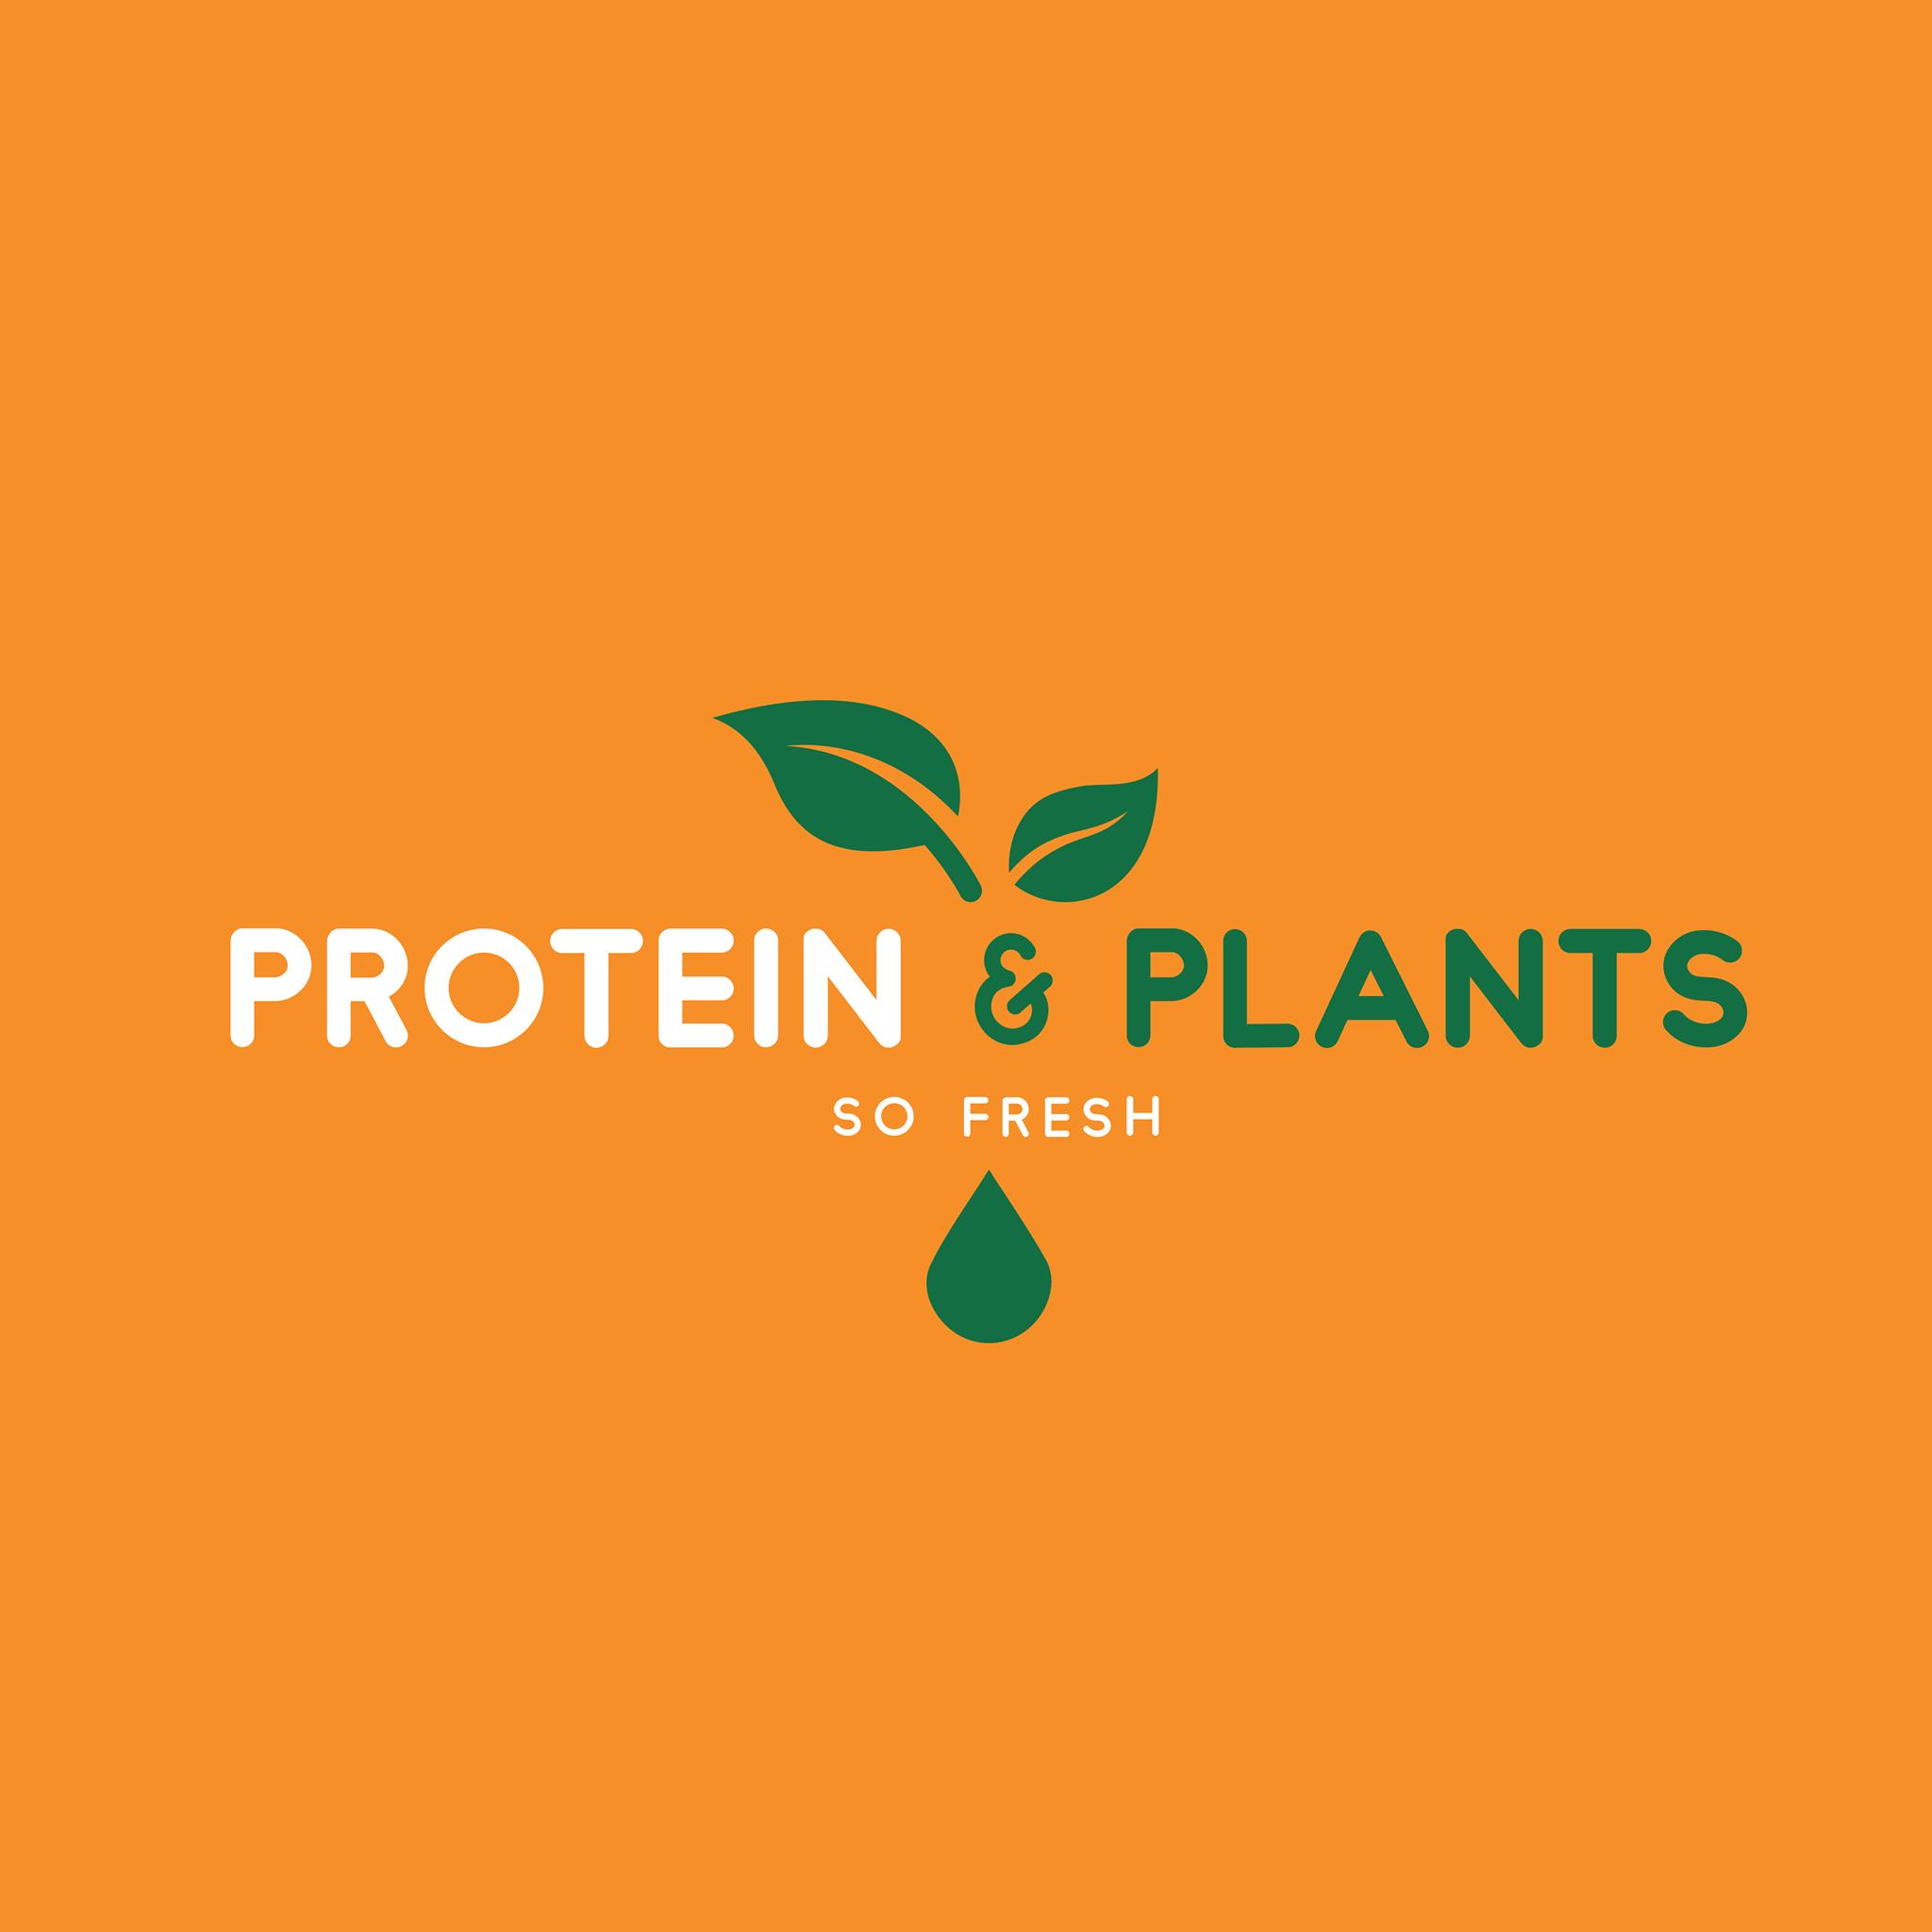 Protein & Plants